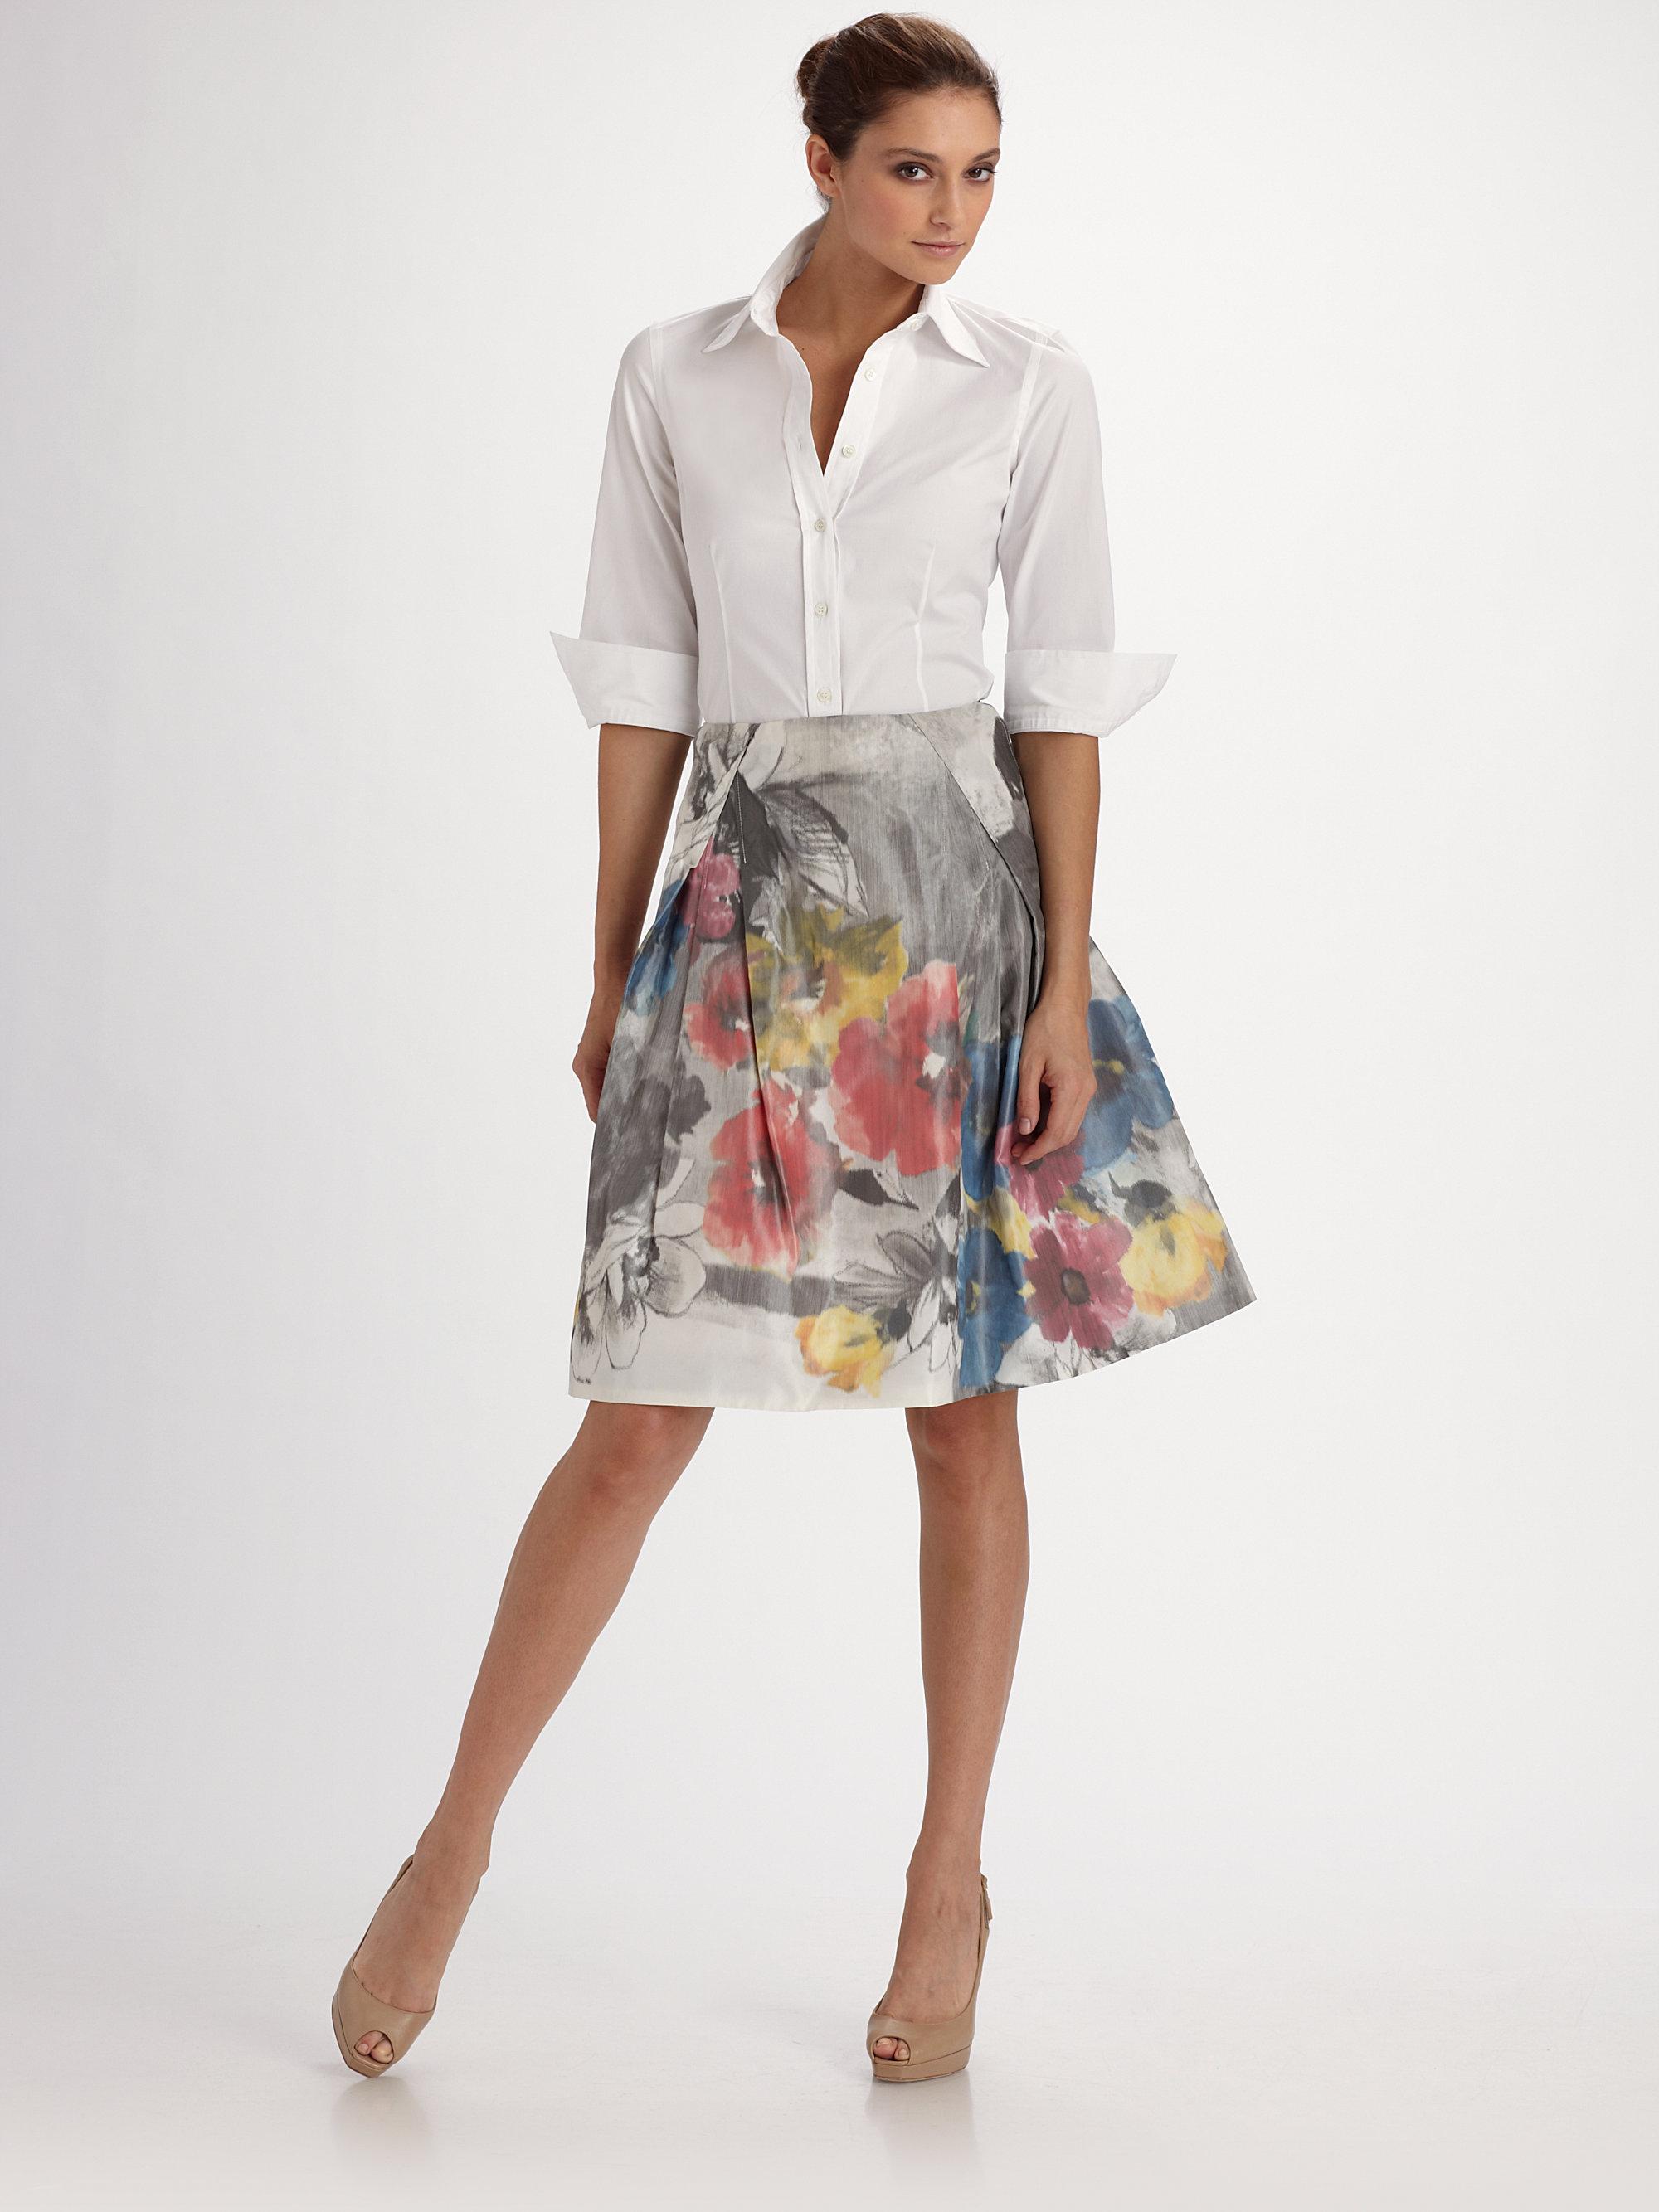 Lyst Carolina Herrera Threequarter Sleeve Blouse In White